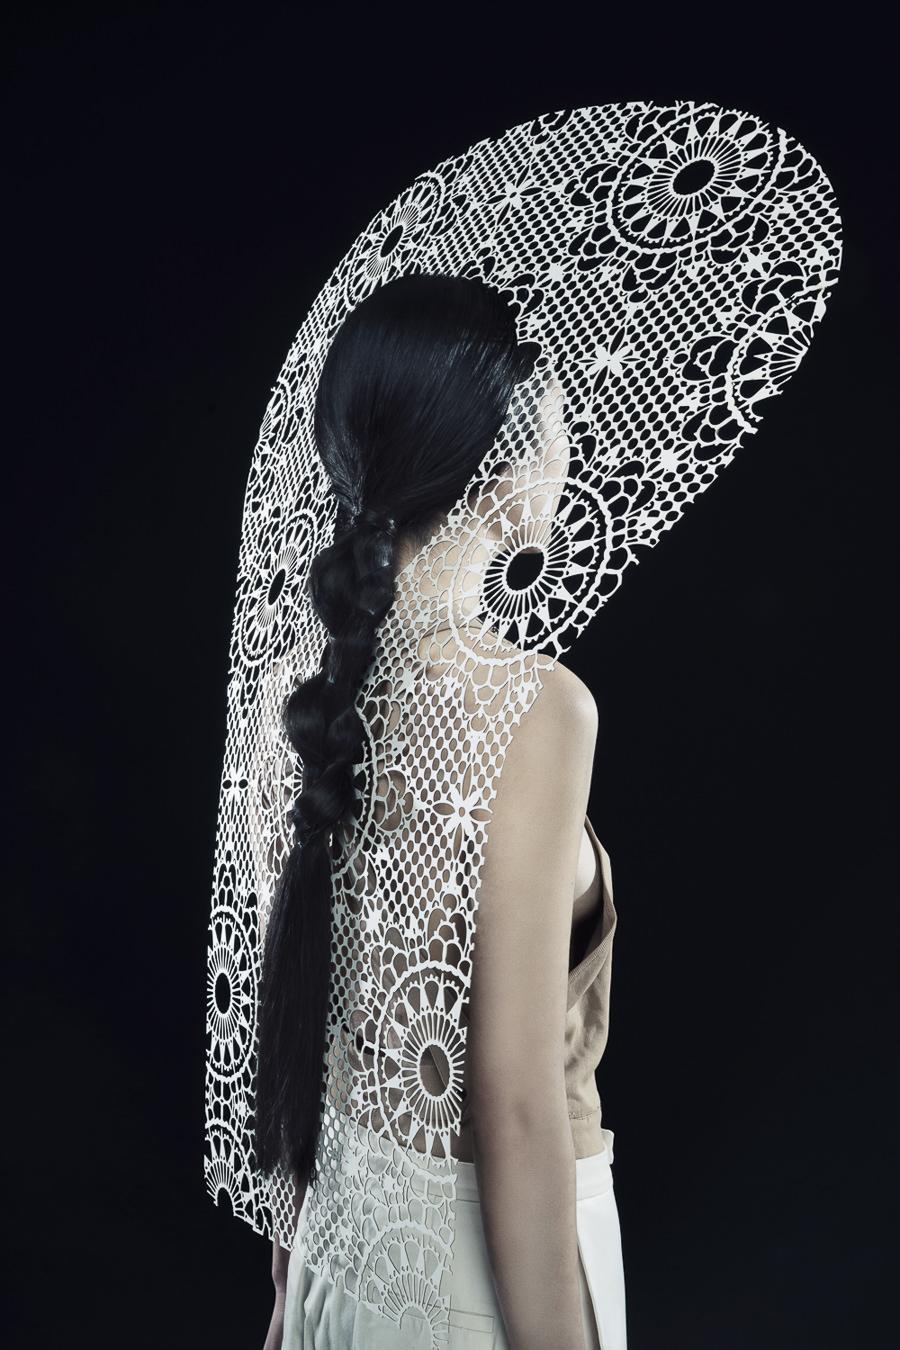 Kamilya Kuspan by Pauline Darley